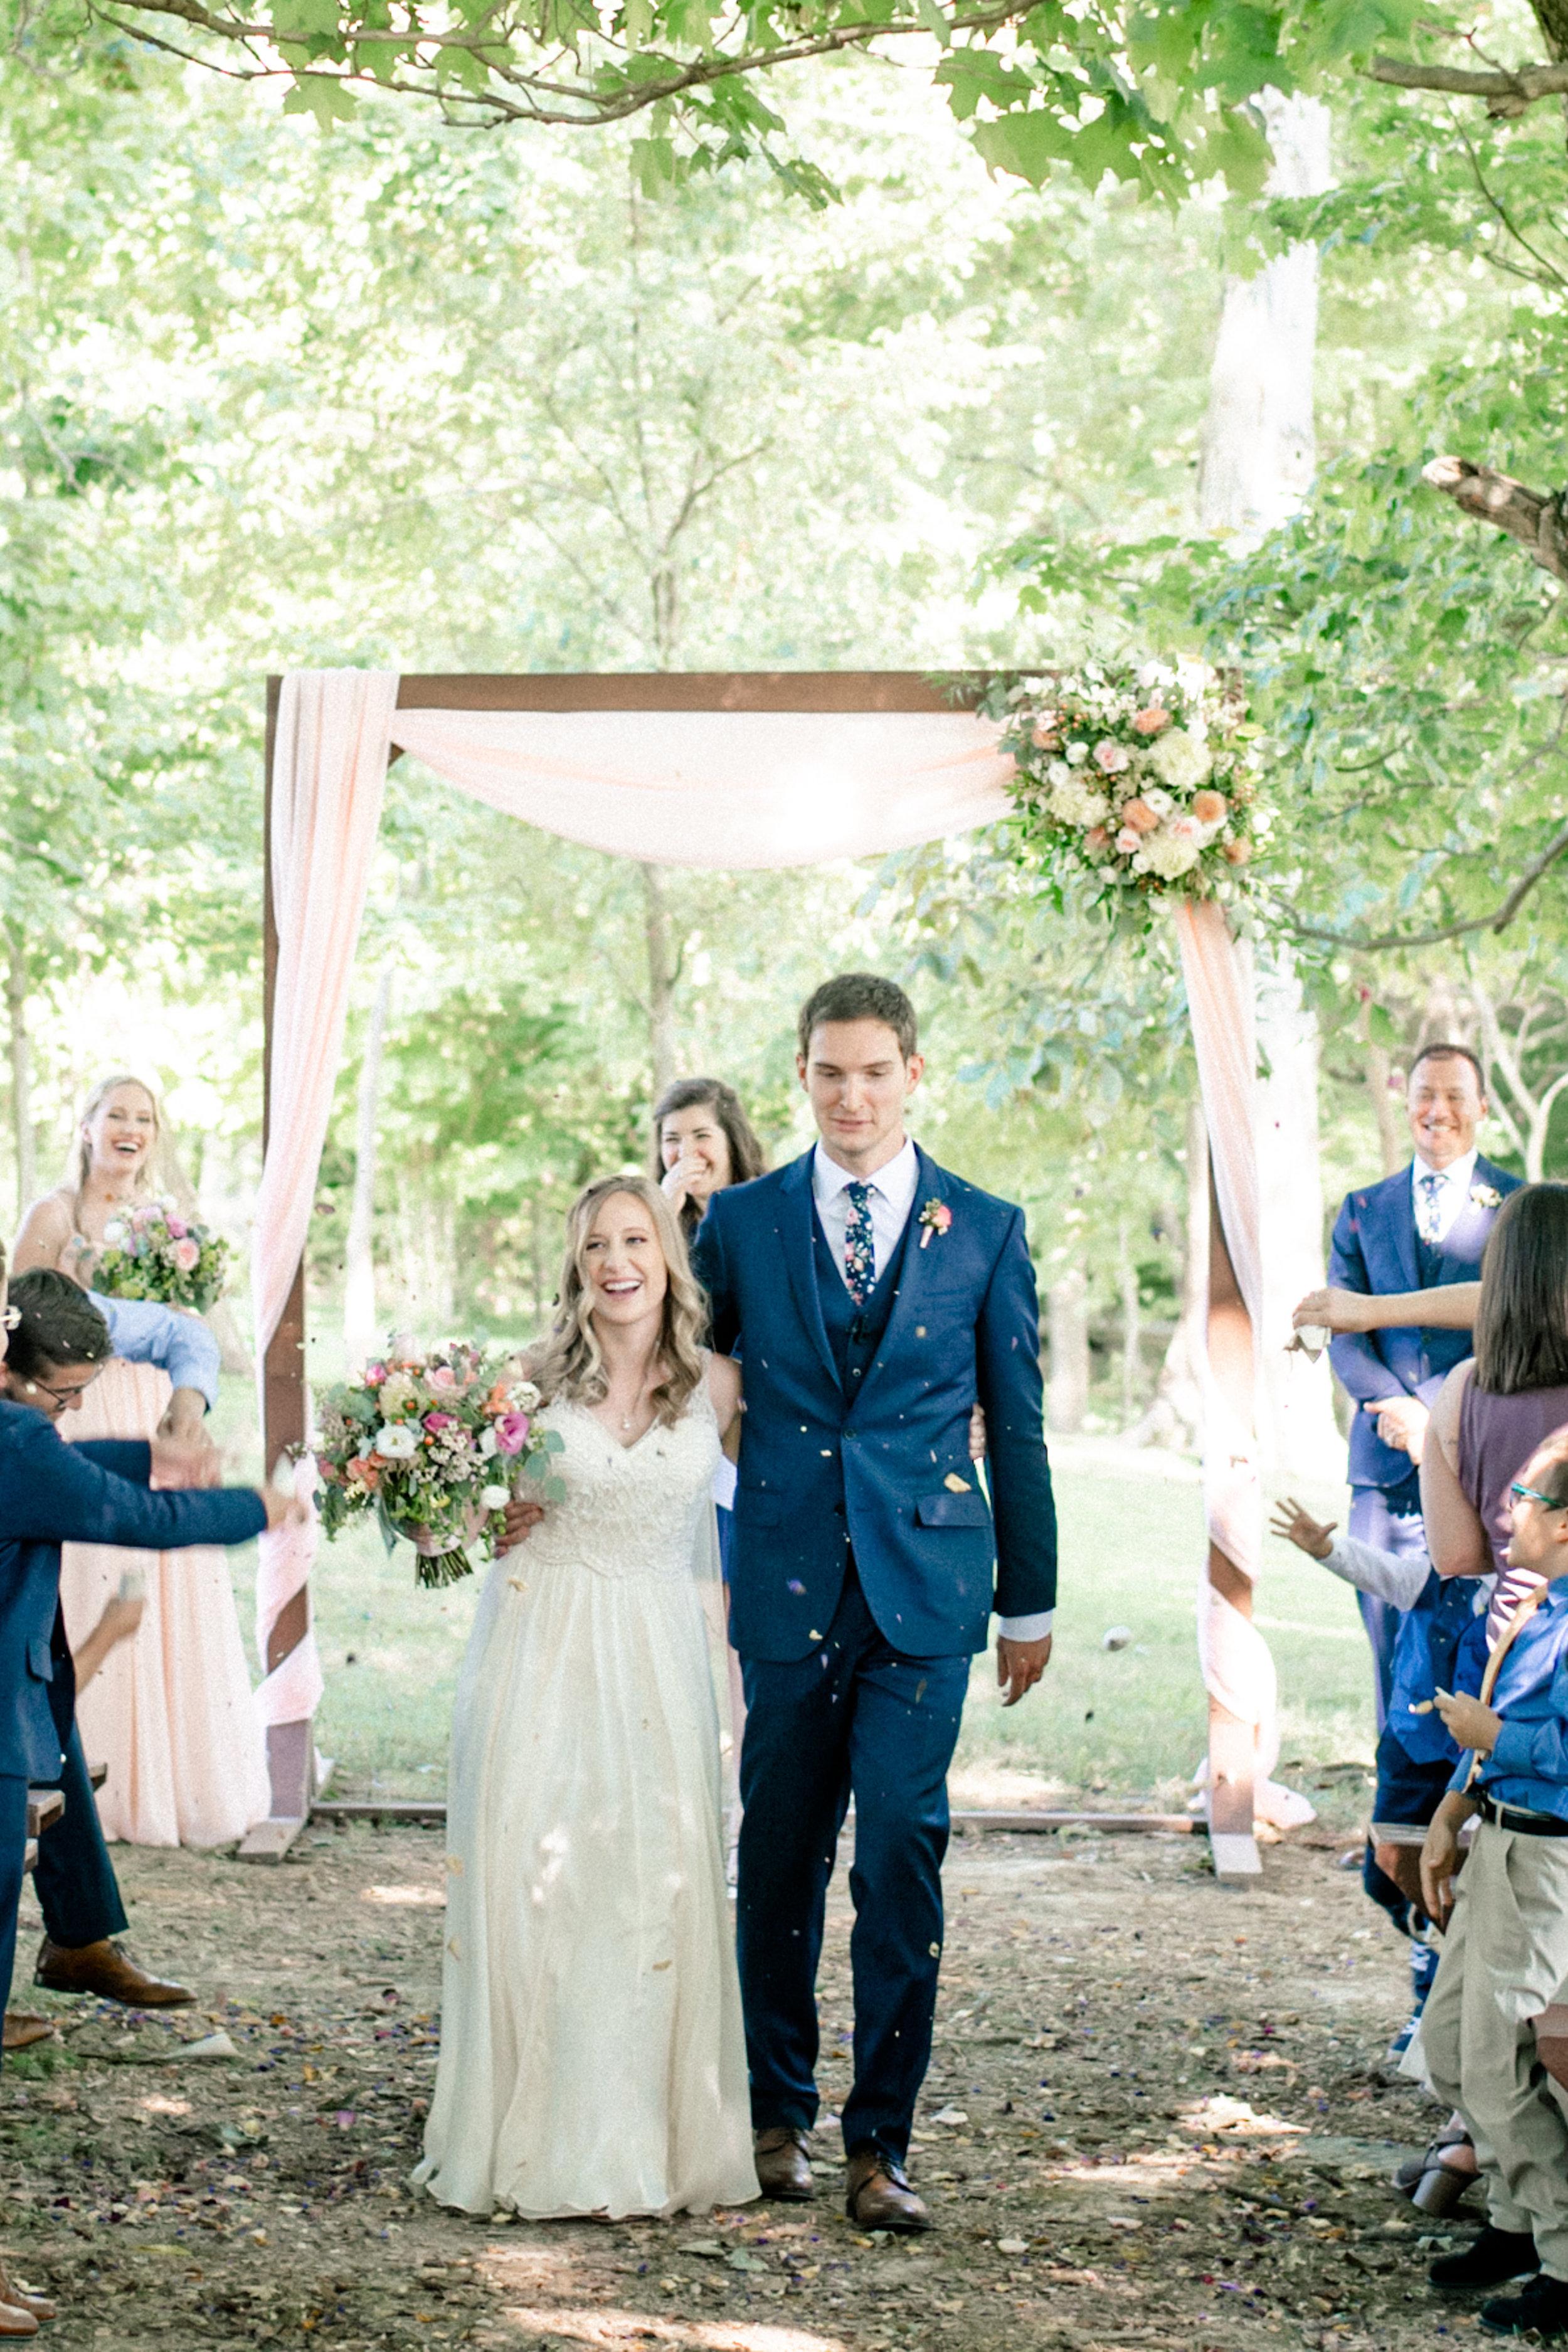 Ceremony-Anna+Dan_(96_of_115).jpg